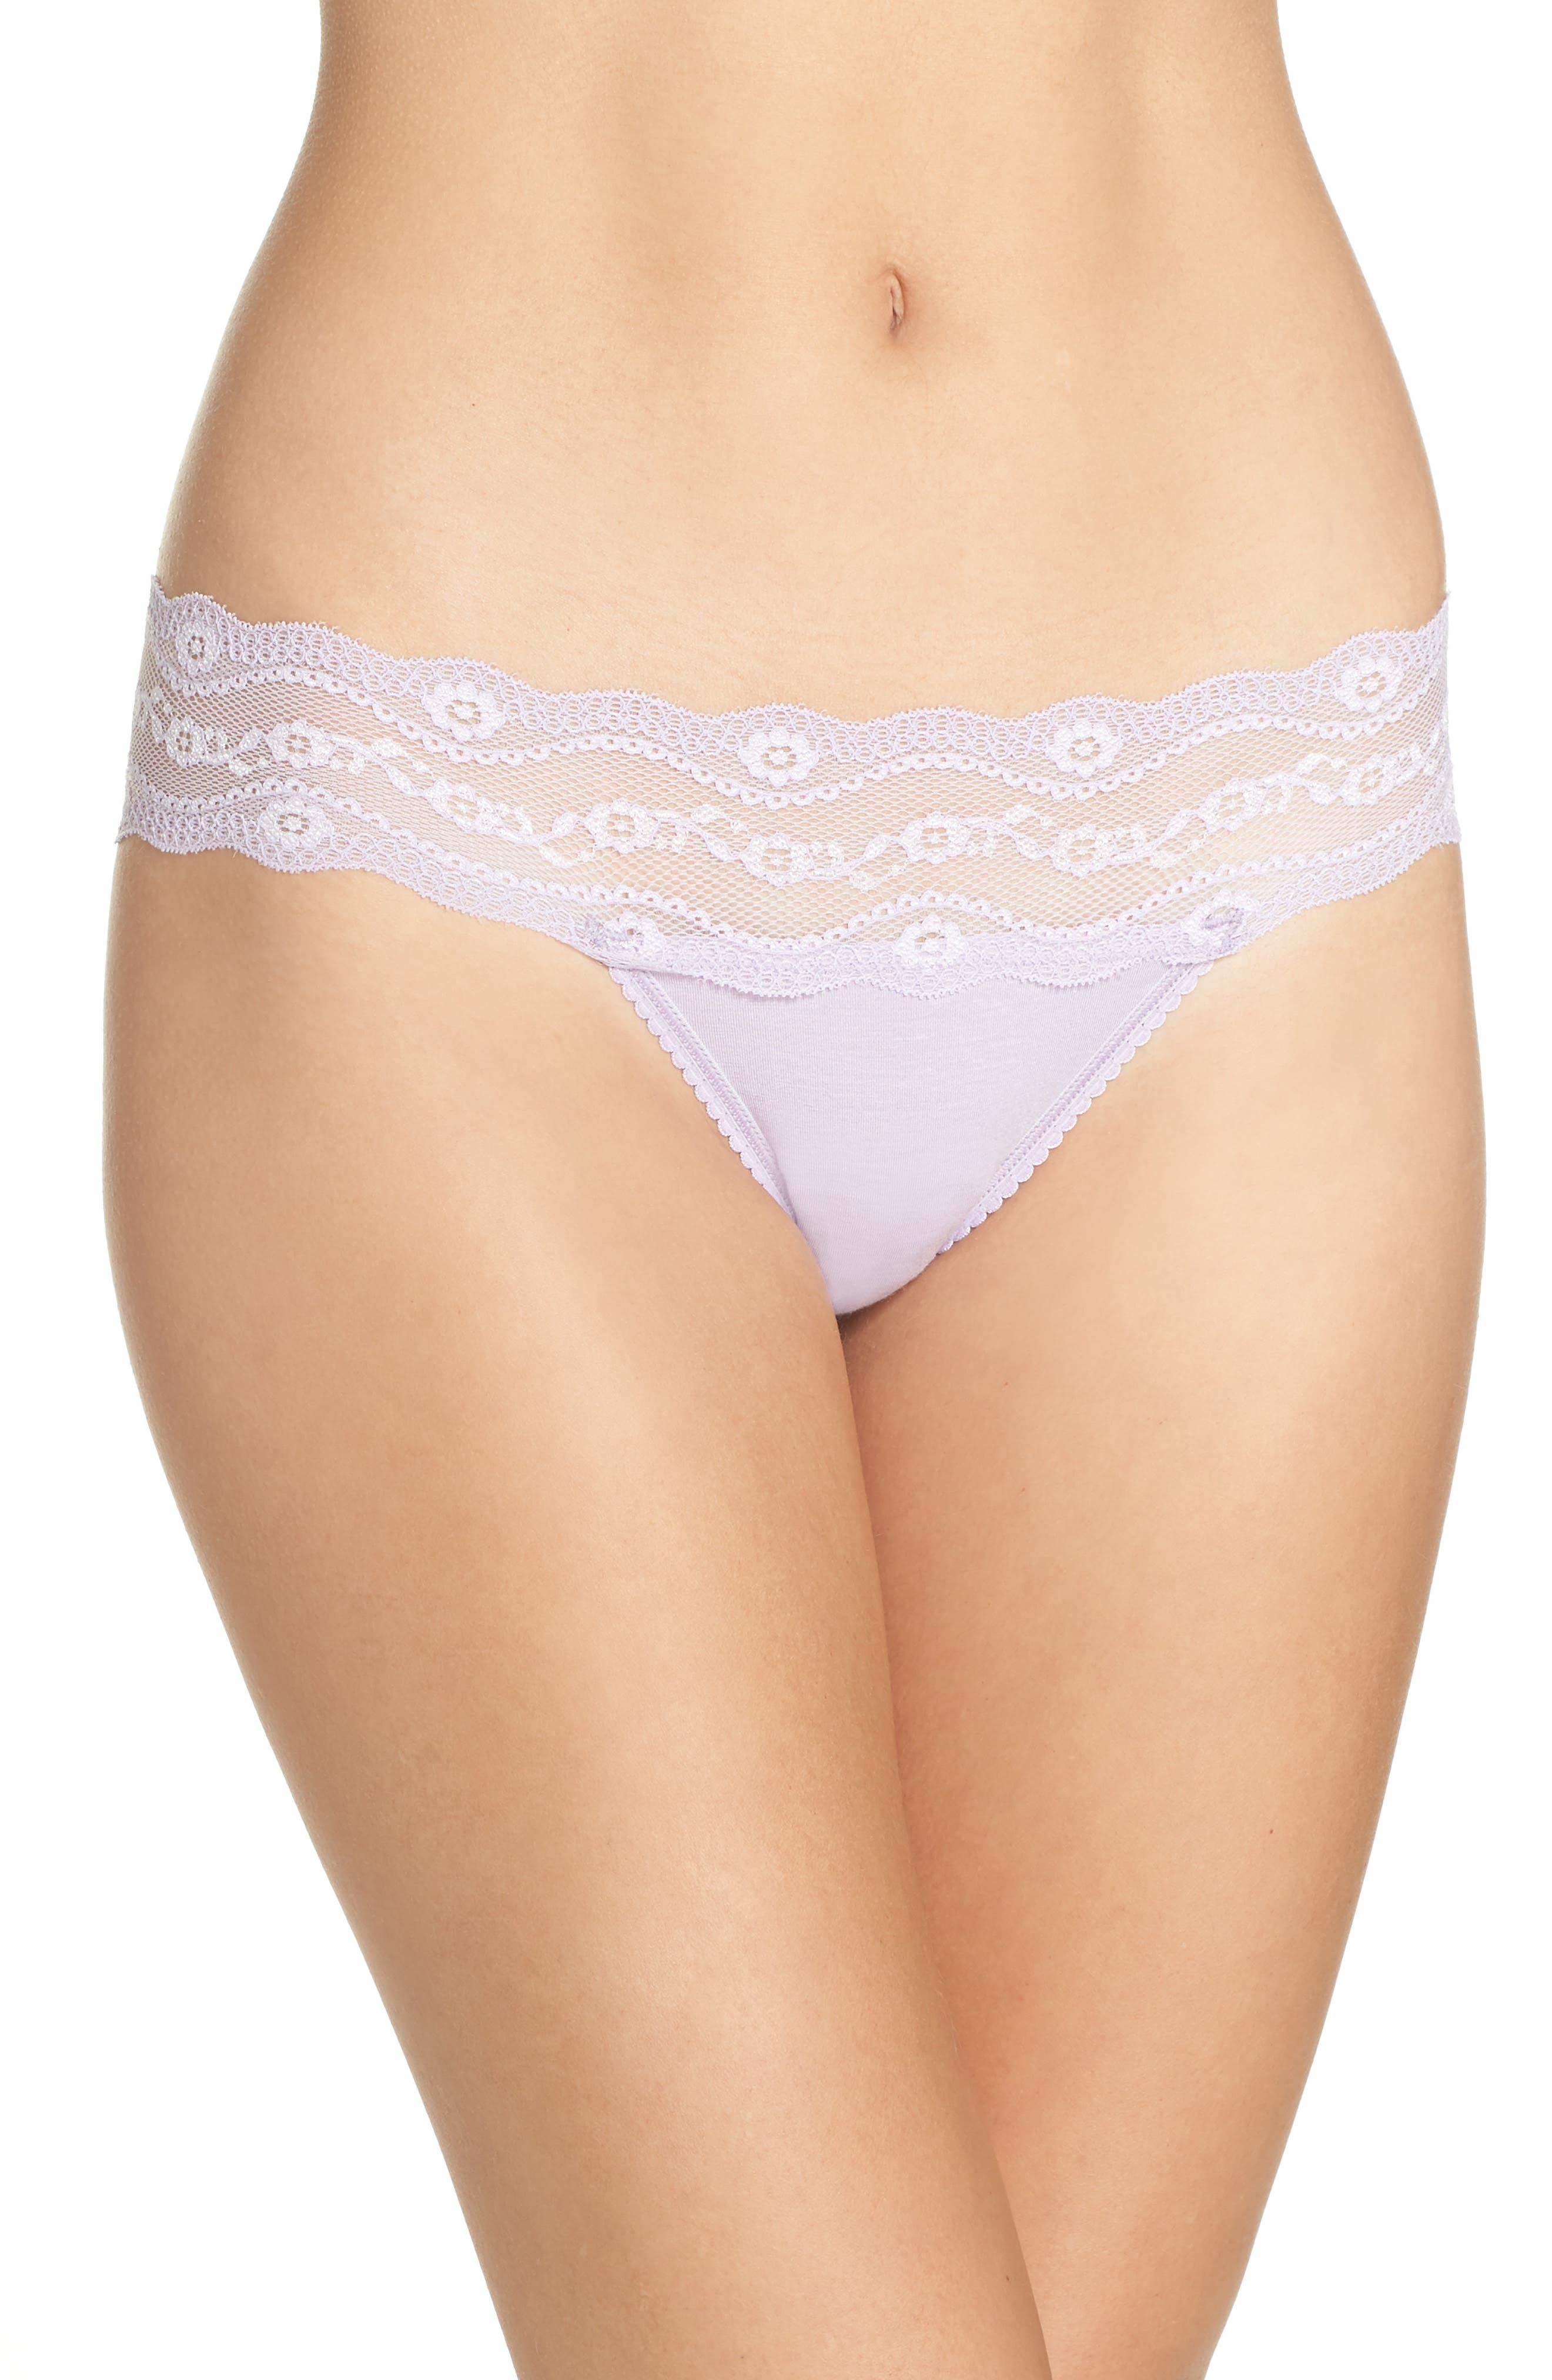 B. Adorable Bikini,                         Main,                         color, 530